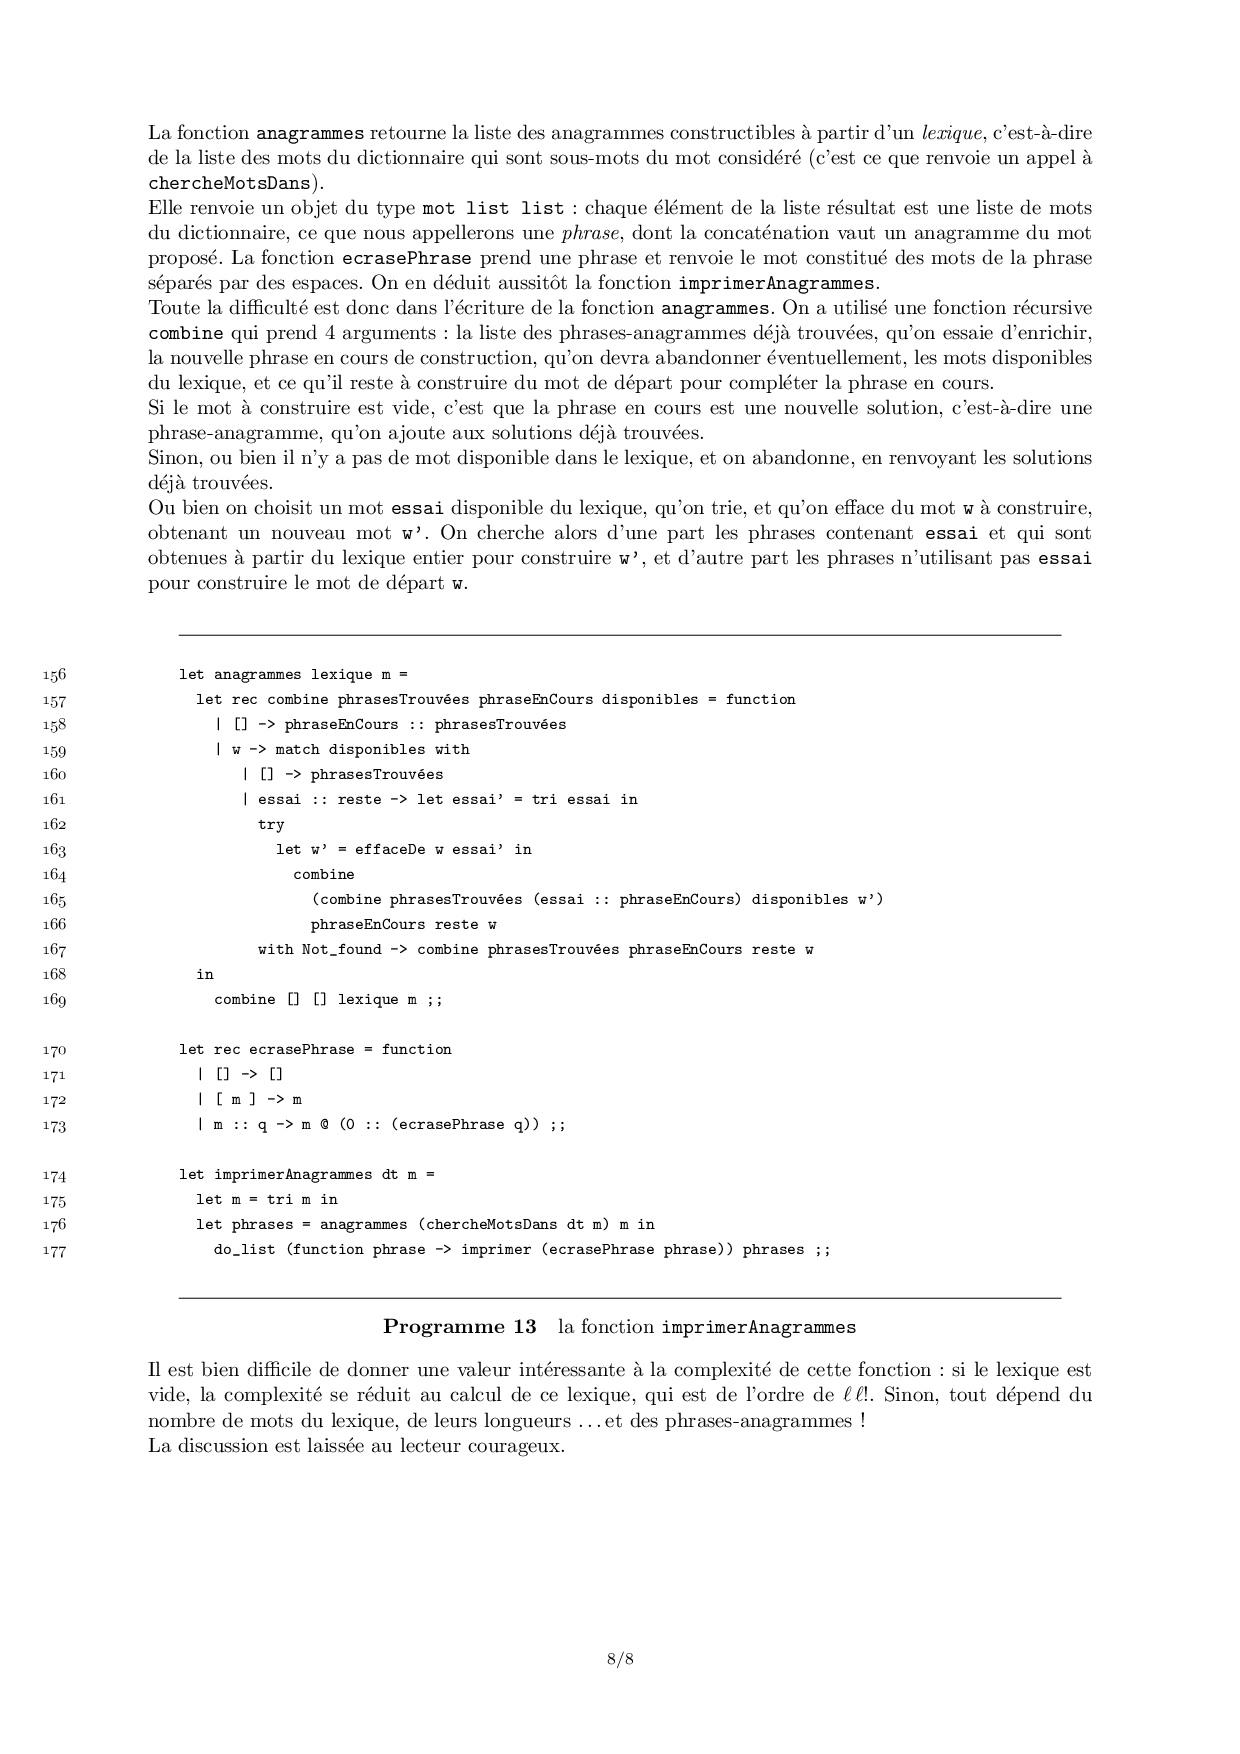 X-Ens Rmatique 2006 Mp Option  Corrigé - Alloschool avec Anagrammes À Imprimer